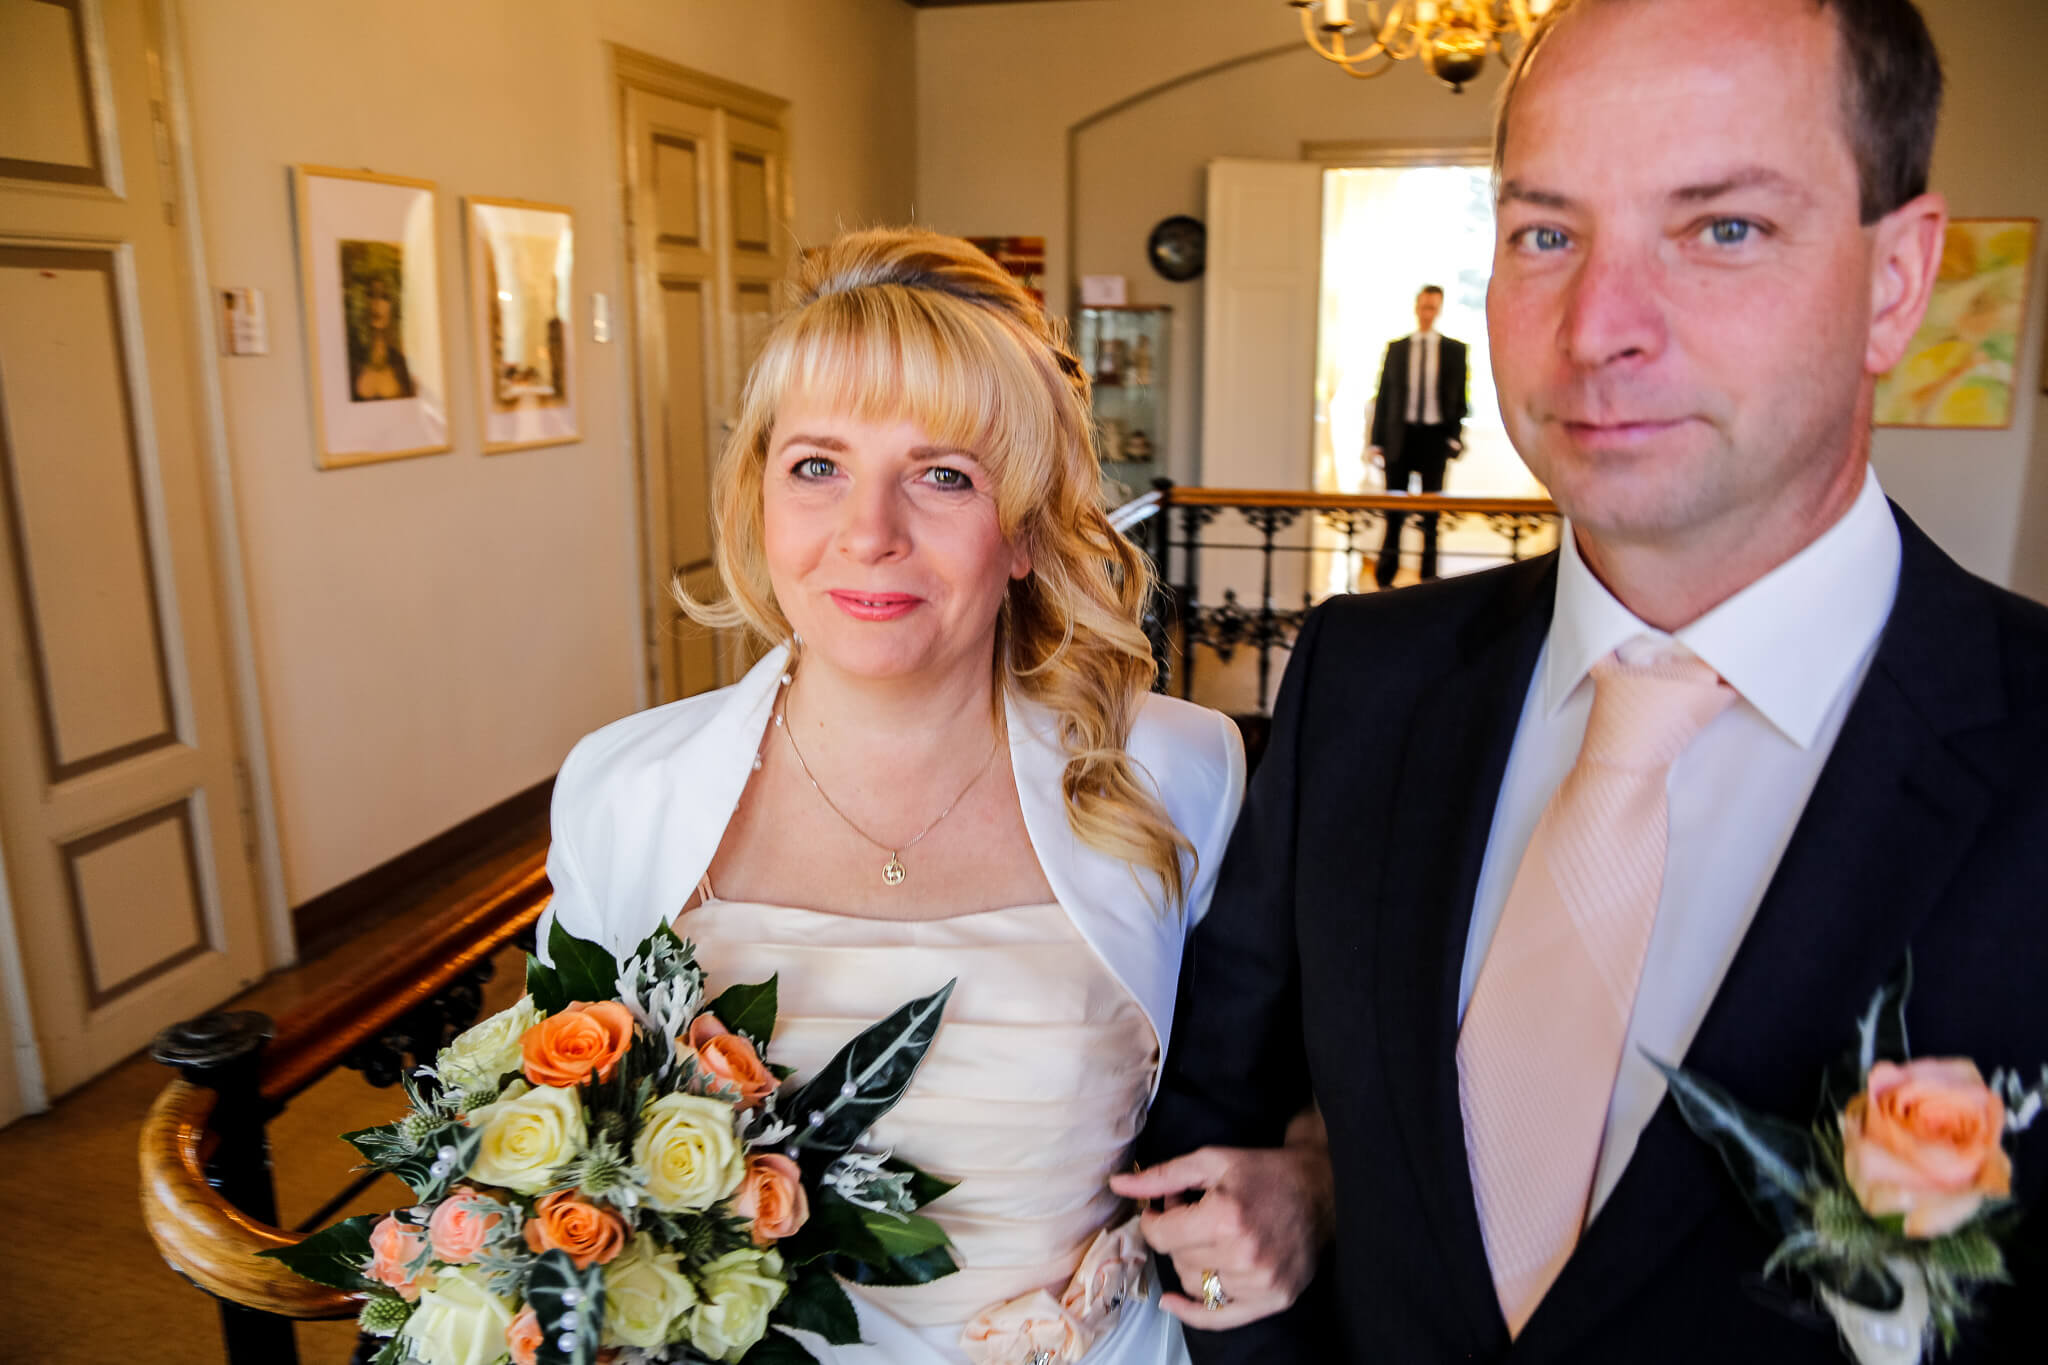 Hochzeitsfotografie in Dresden, Radebeul & Umgebung